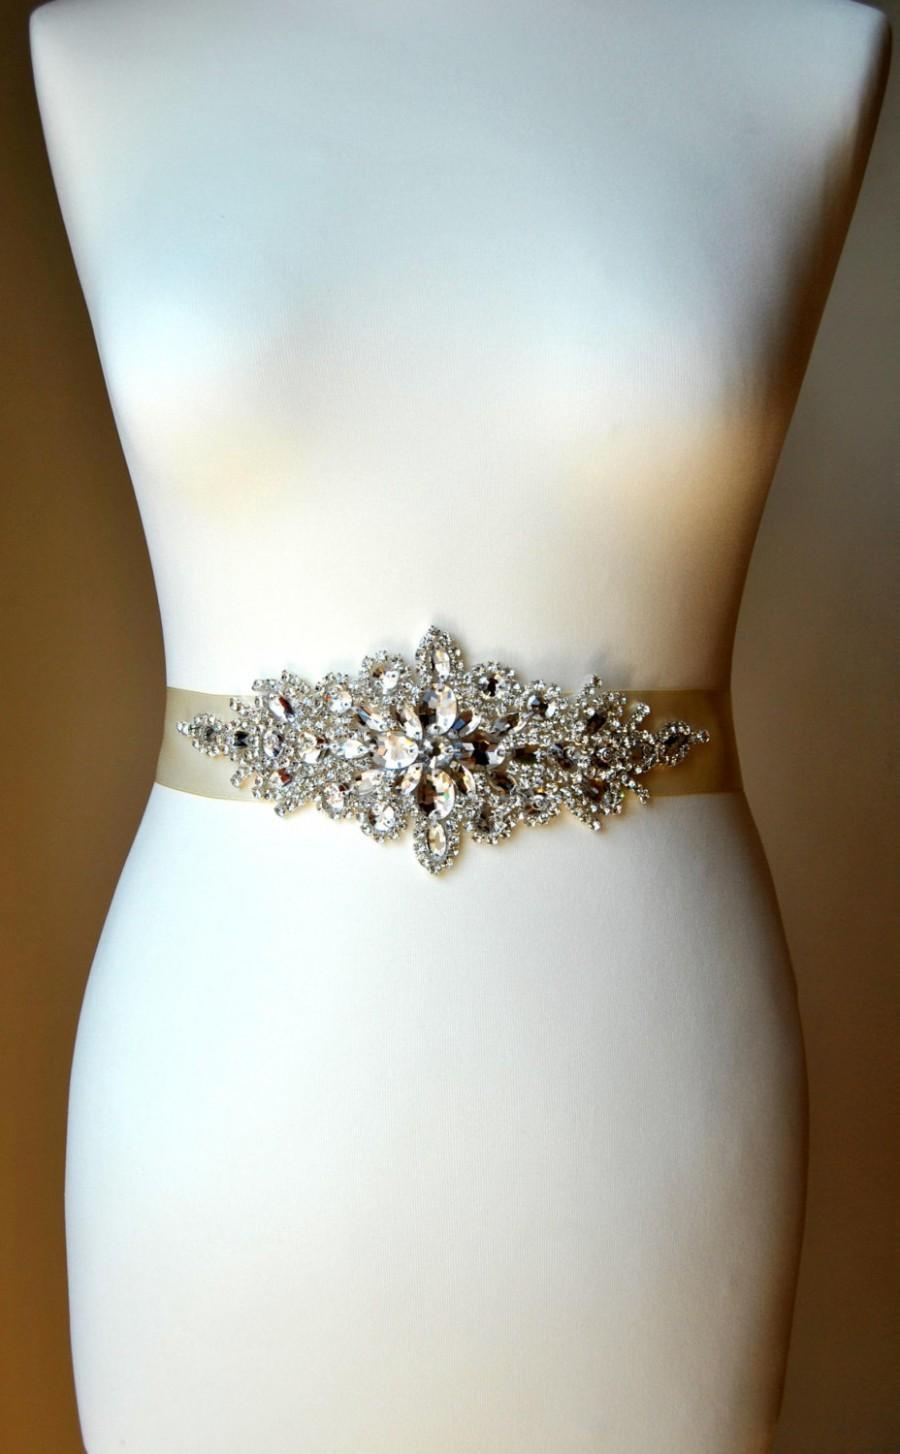 Mariage - Luxury Crystal Bridal Sash,Wedding Dress Sash Belt,  Rhinestone Sash,  Rhinestone Bridal Bridesmaid Sash Belt, Wedding dress sash